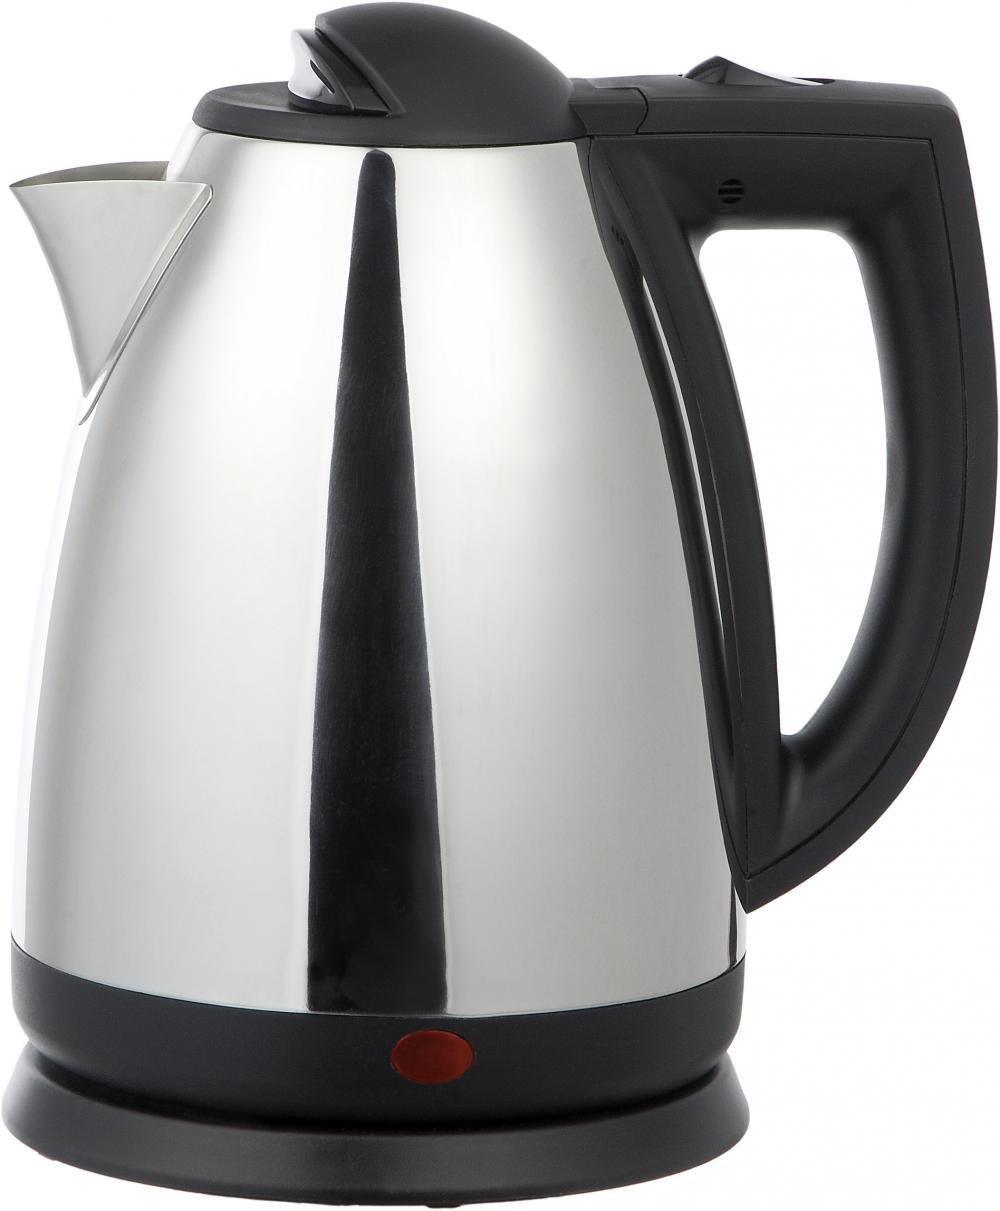 Brentwood Appliances Brentwood Appliances 2.0-Liter Stainless Steel Electric Cordless Tea Kettle, 1000-watt, Brushed, Stainless Steel KT-1800